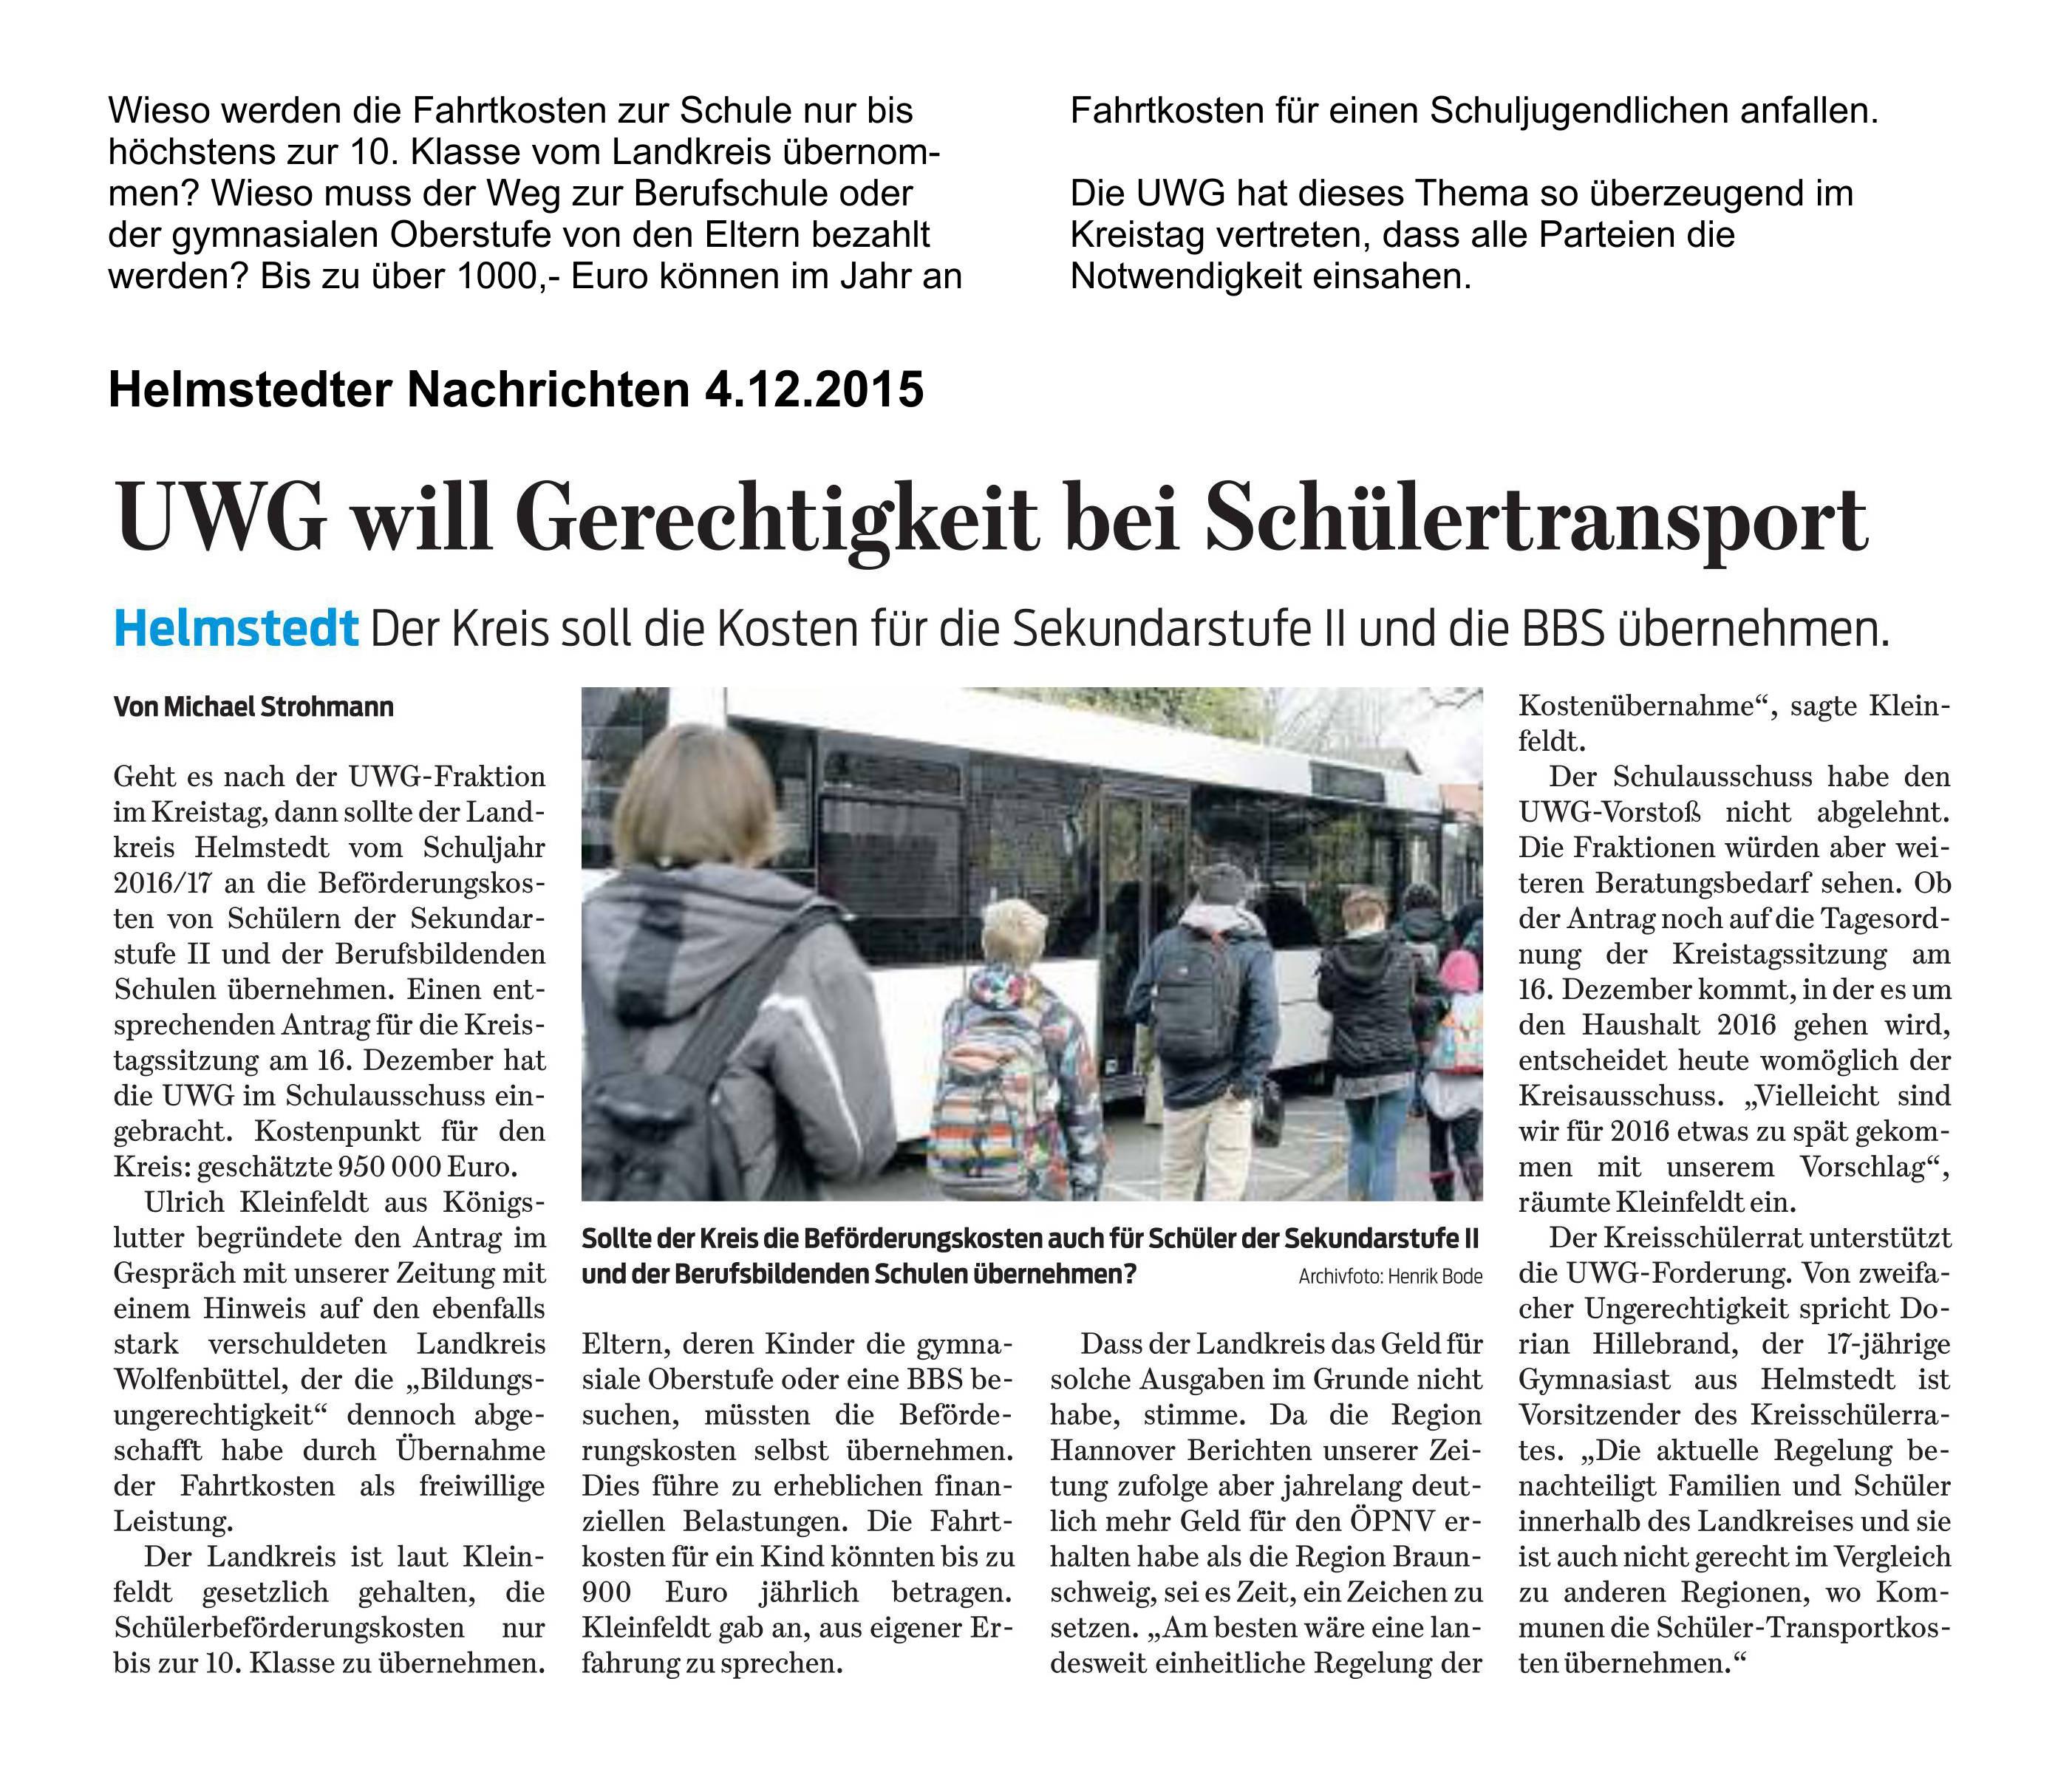 Pressebericht zum Thema Schülertransport